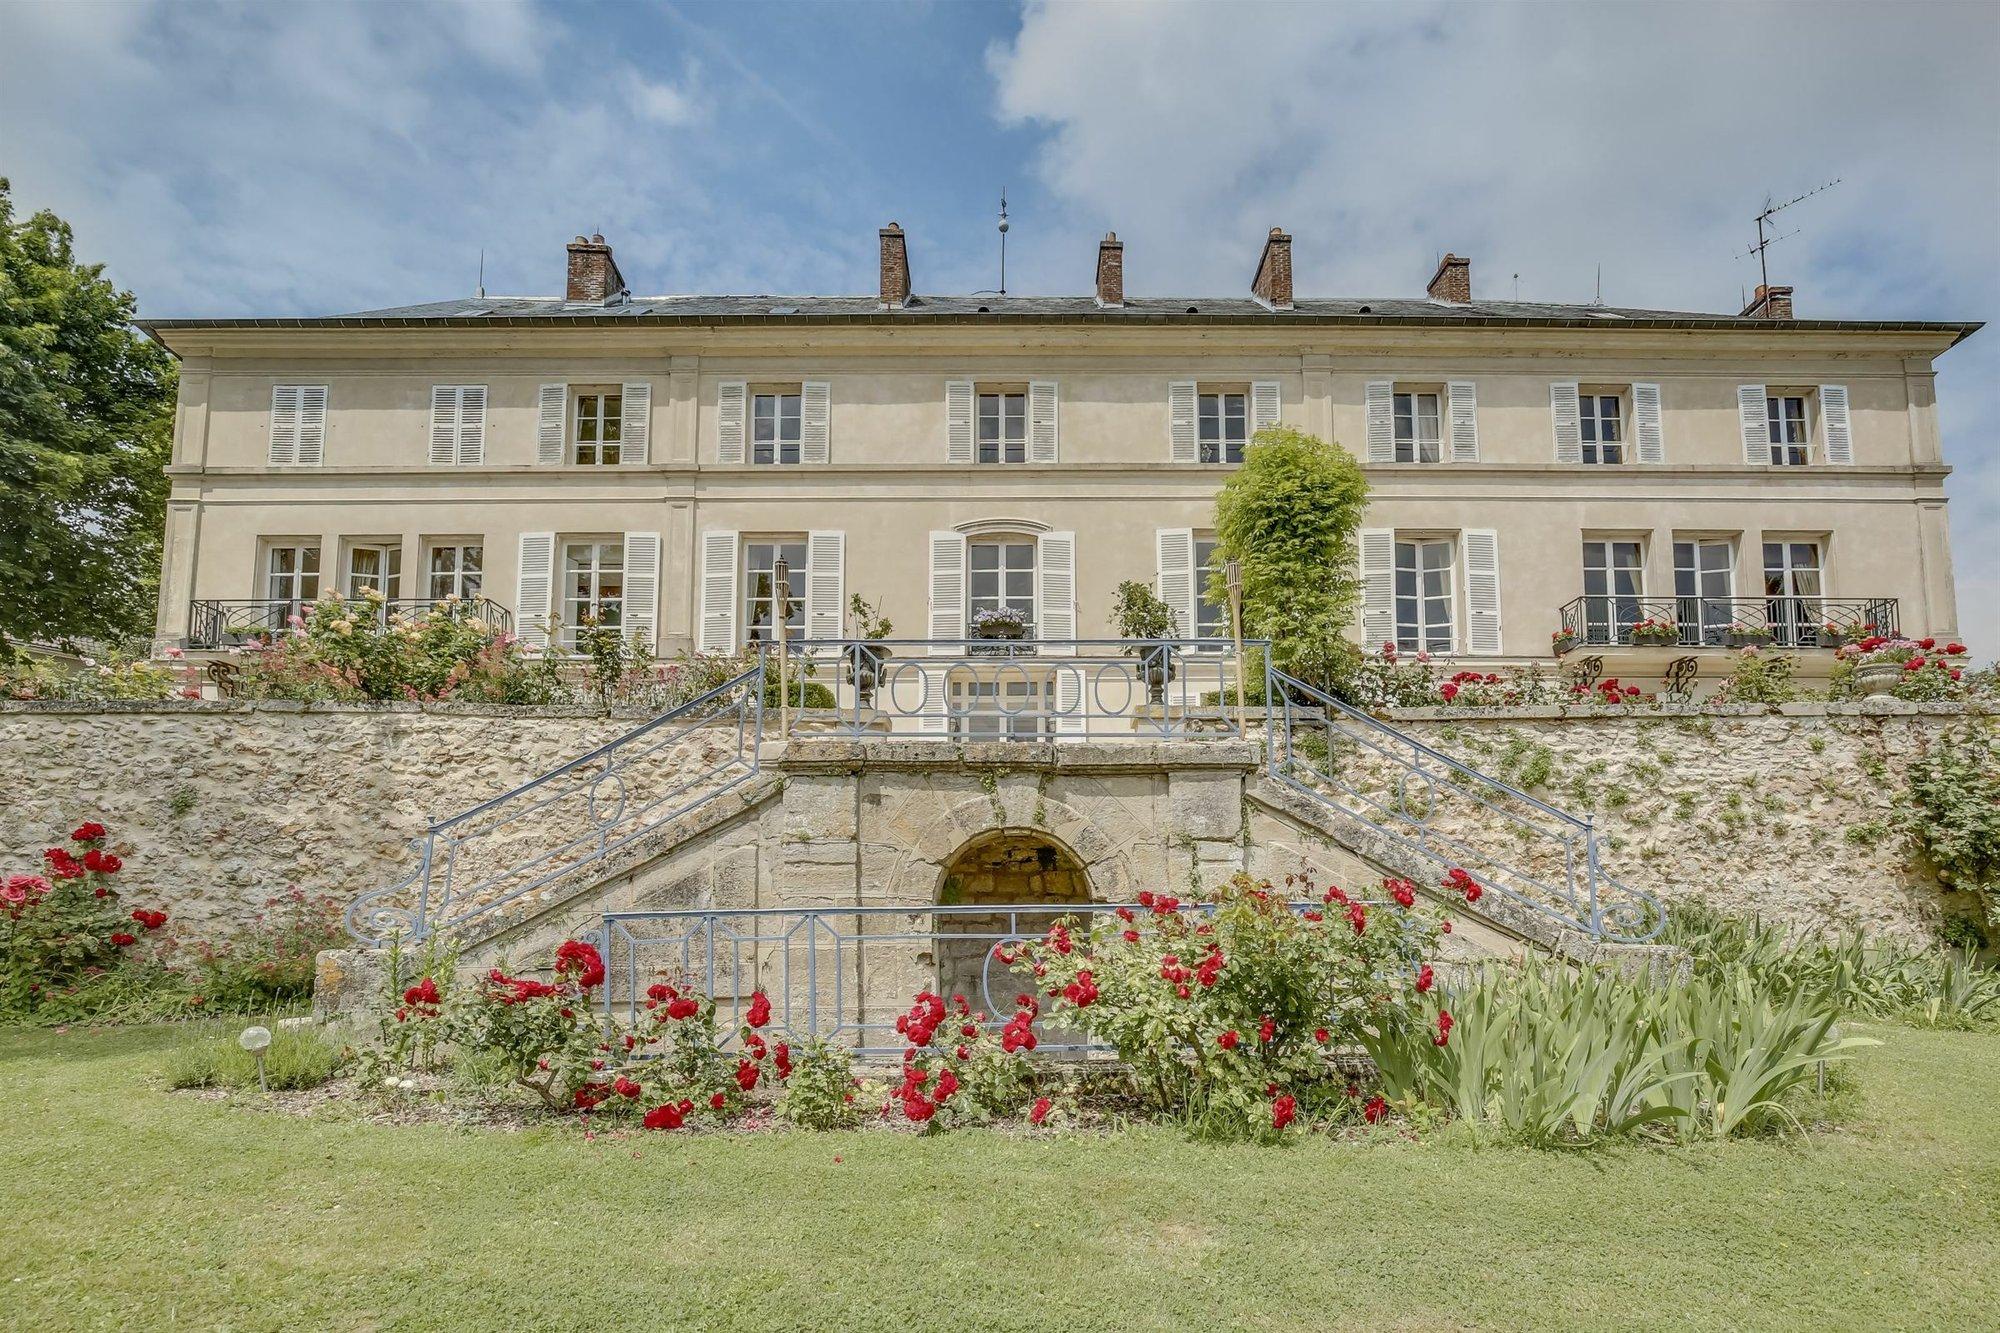 House in Saint-Germain-en-Laye, Île-de-France, France 1